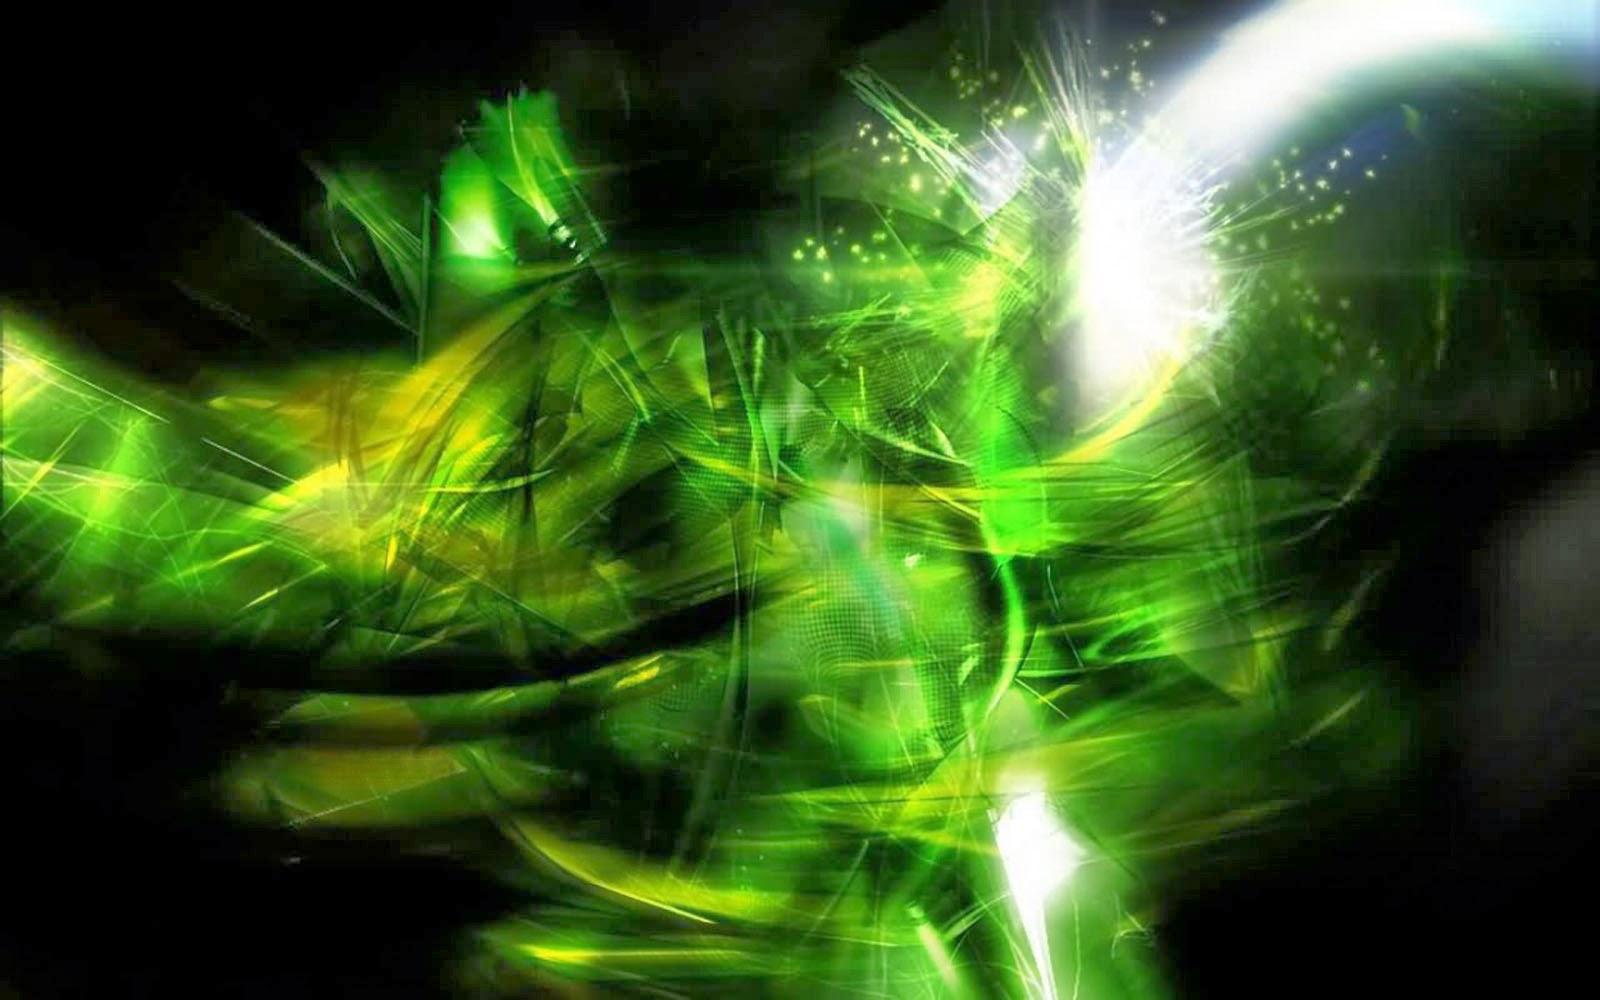 wallpapers: Abstract Green Wallpapers Abstract Green Desktop Wallpaper